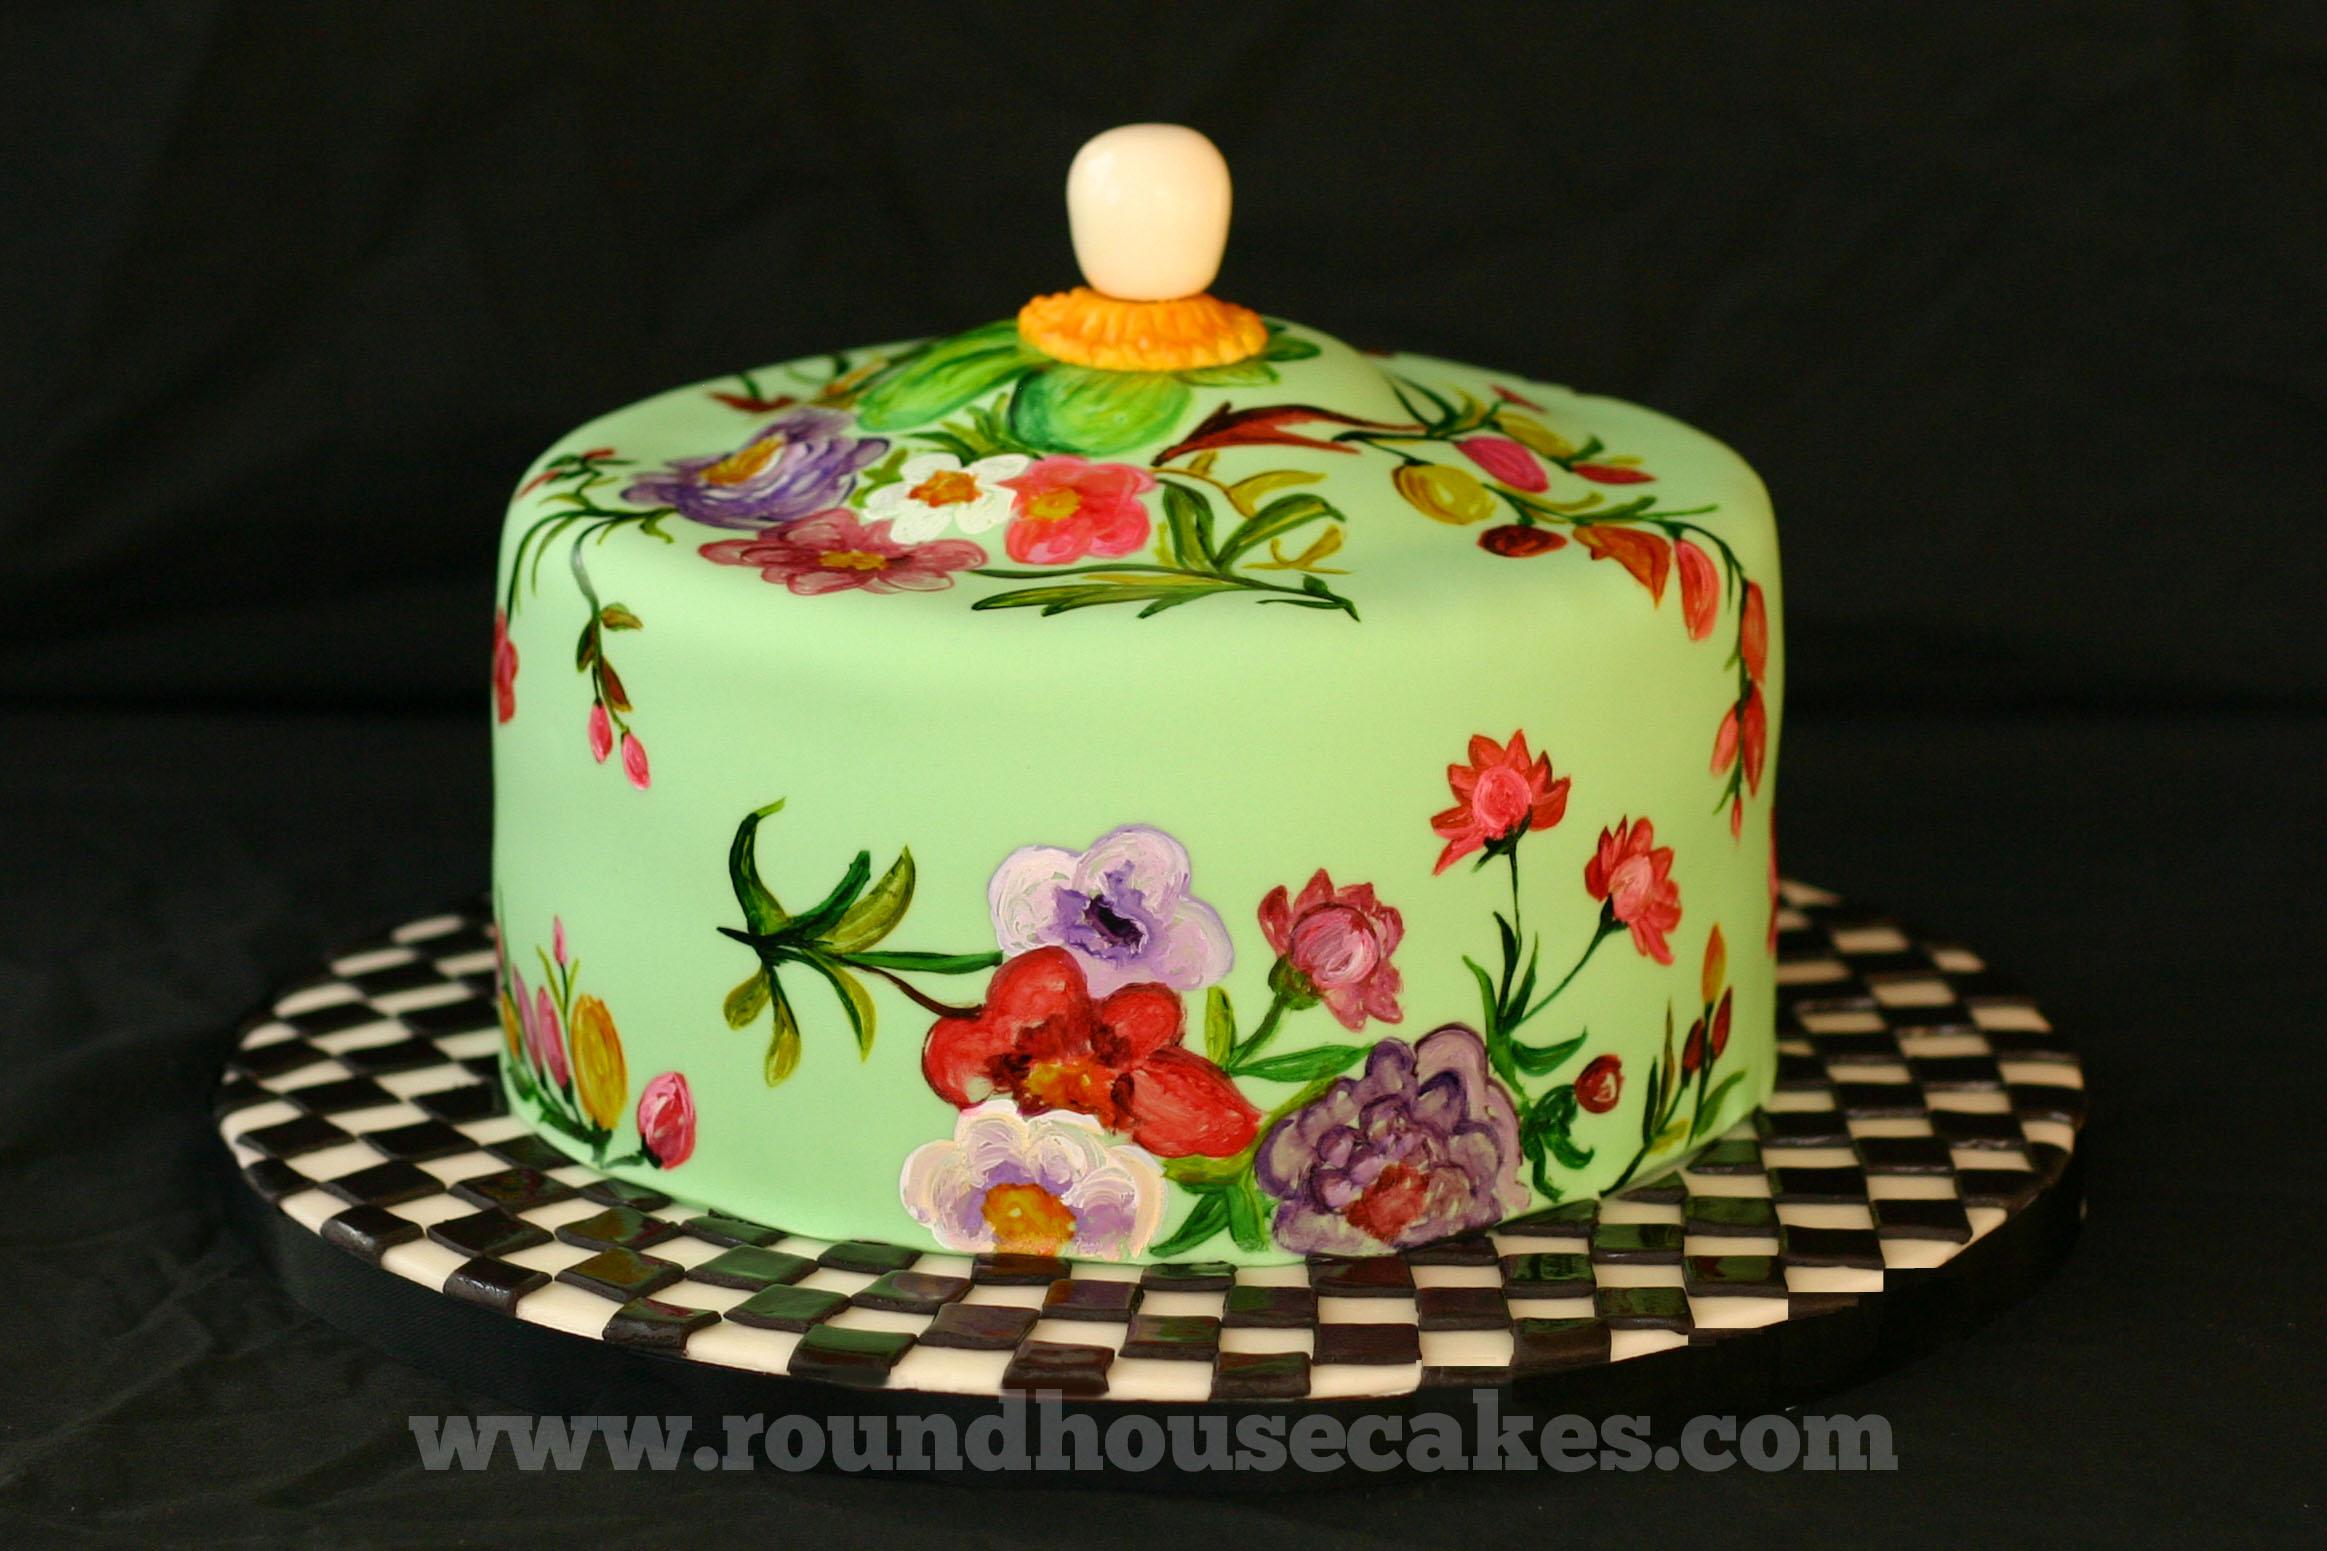 Cake Painting - Stuff I Make